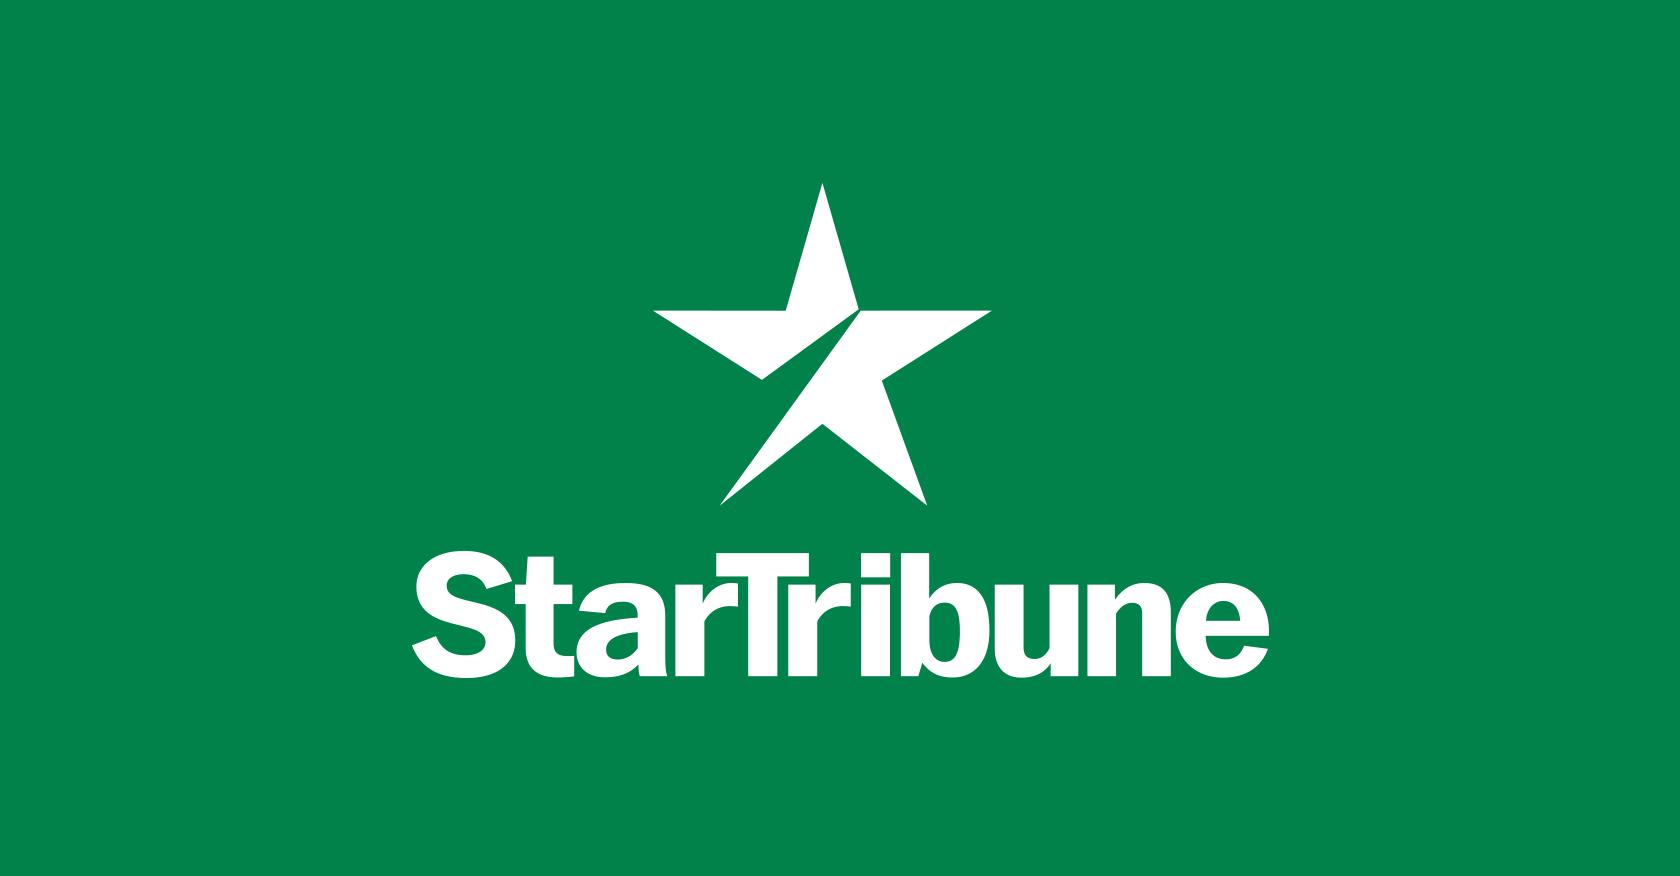 Twins tout home-field edge against Astros, even without fans - Minneapolis Star Tribune